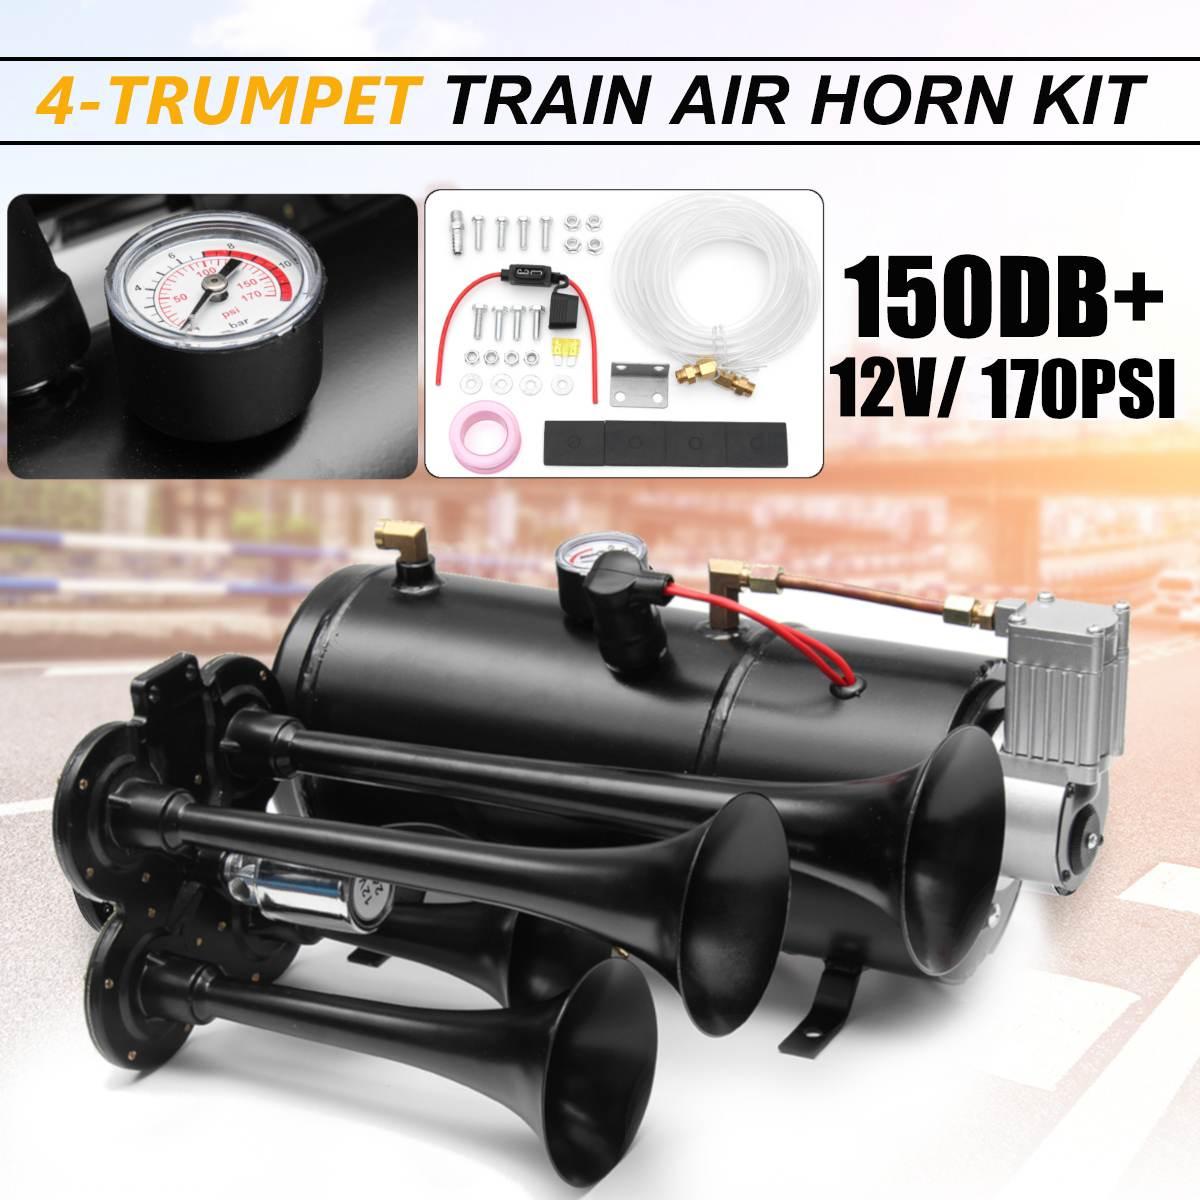 Camion Treno Quad 4 Tromba Air Horn Kit Nero 170 PSI 12V 3 Litri Compressore e Casa 150db